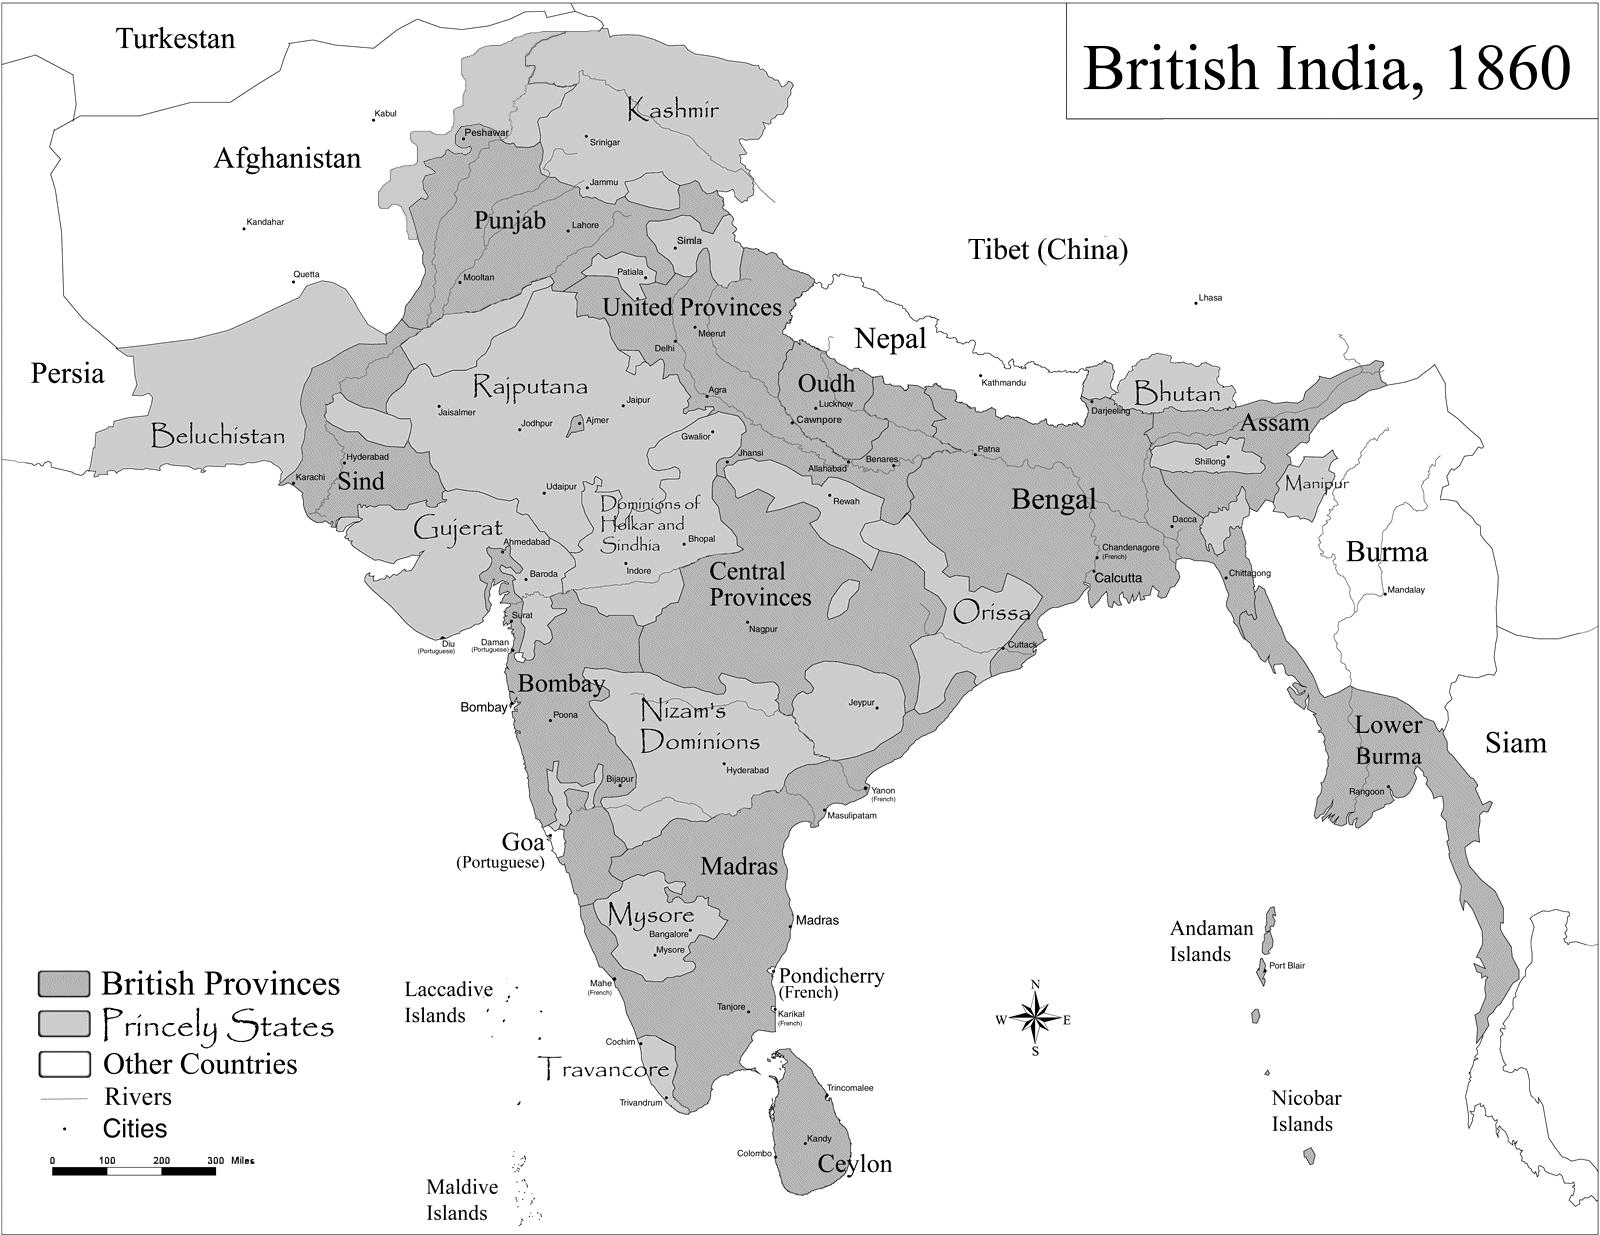 http://3.bp.blogspot.com/_f44t_CwXxhc/S-Vc6msRmRI/AAAAAAAAC3M/1G9IfPdzOgs/s1600/British_Indian%2BMap.png